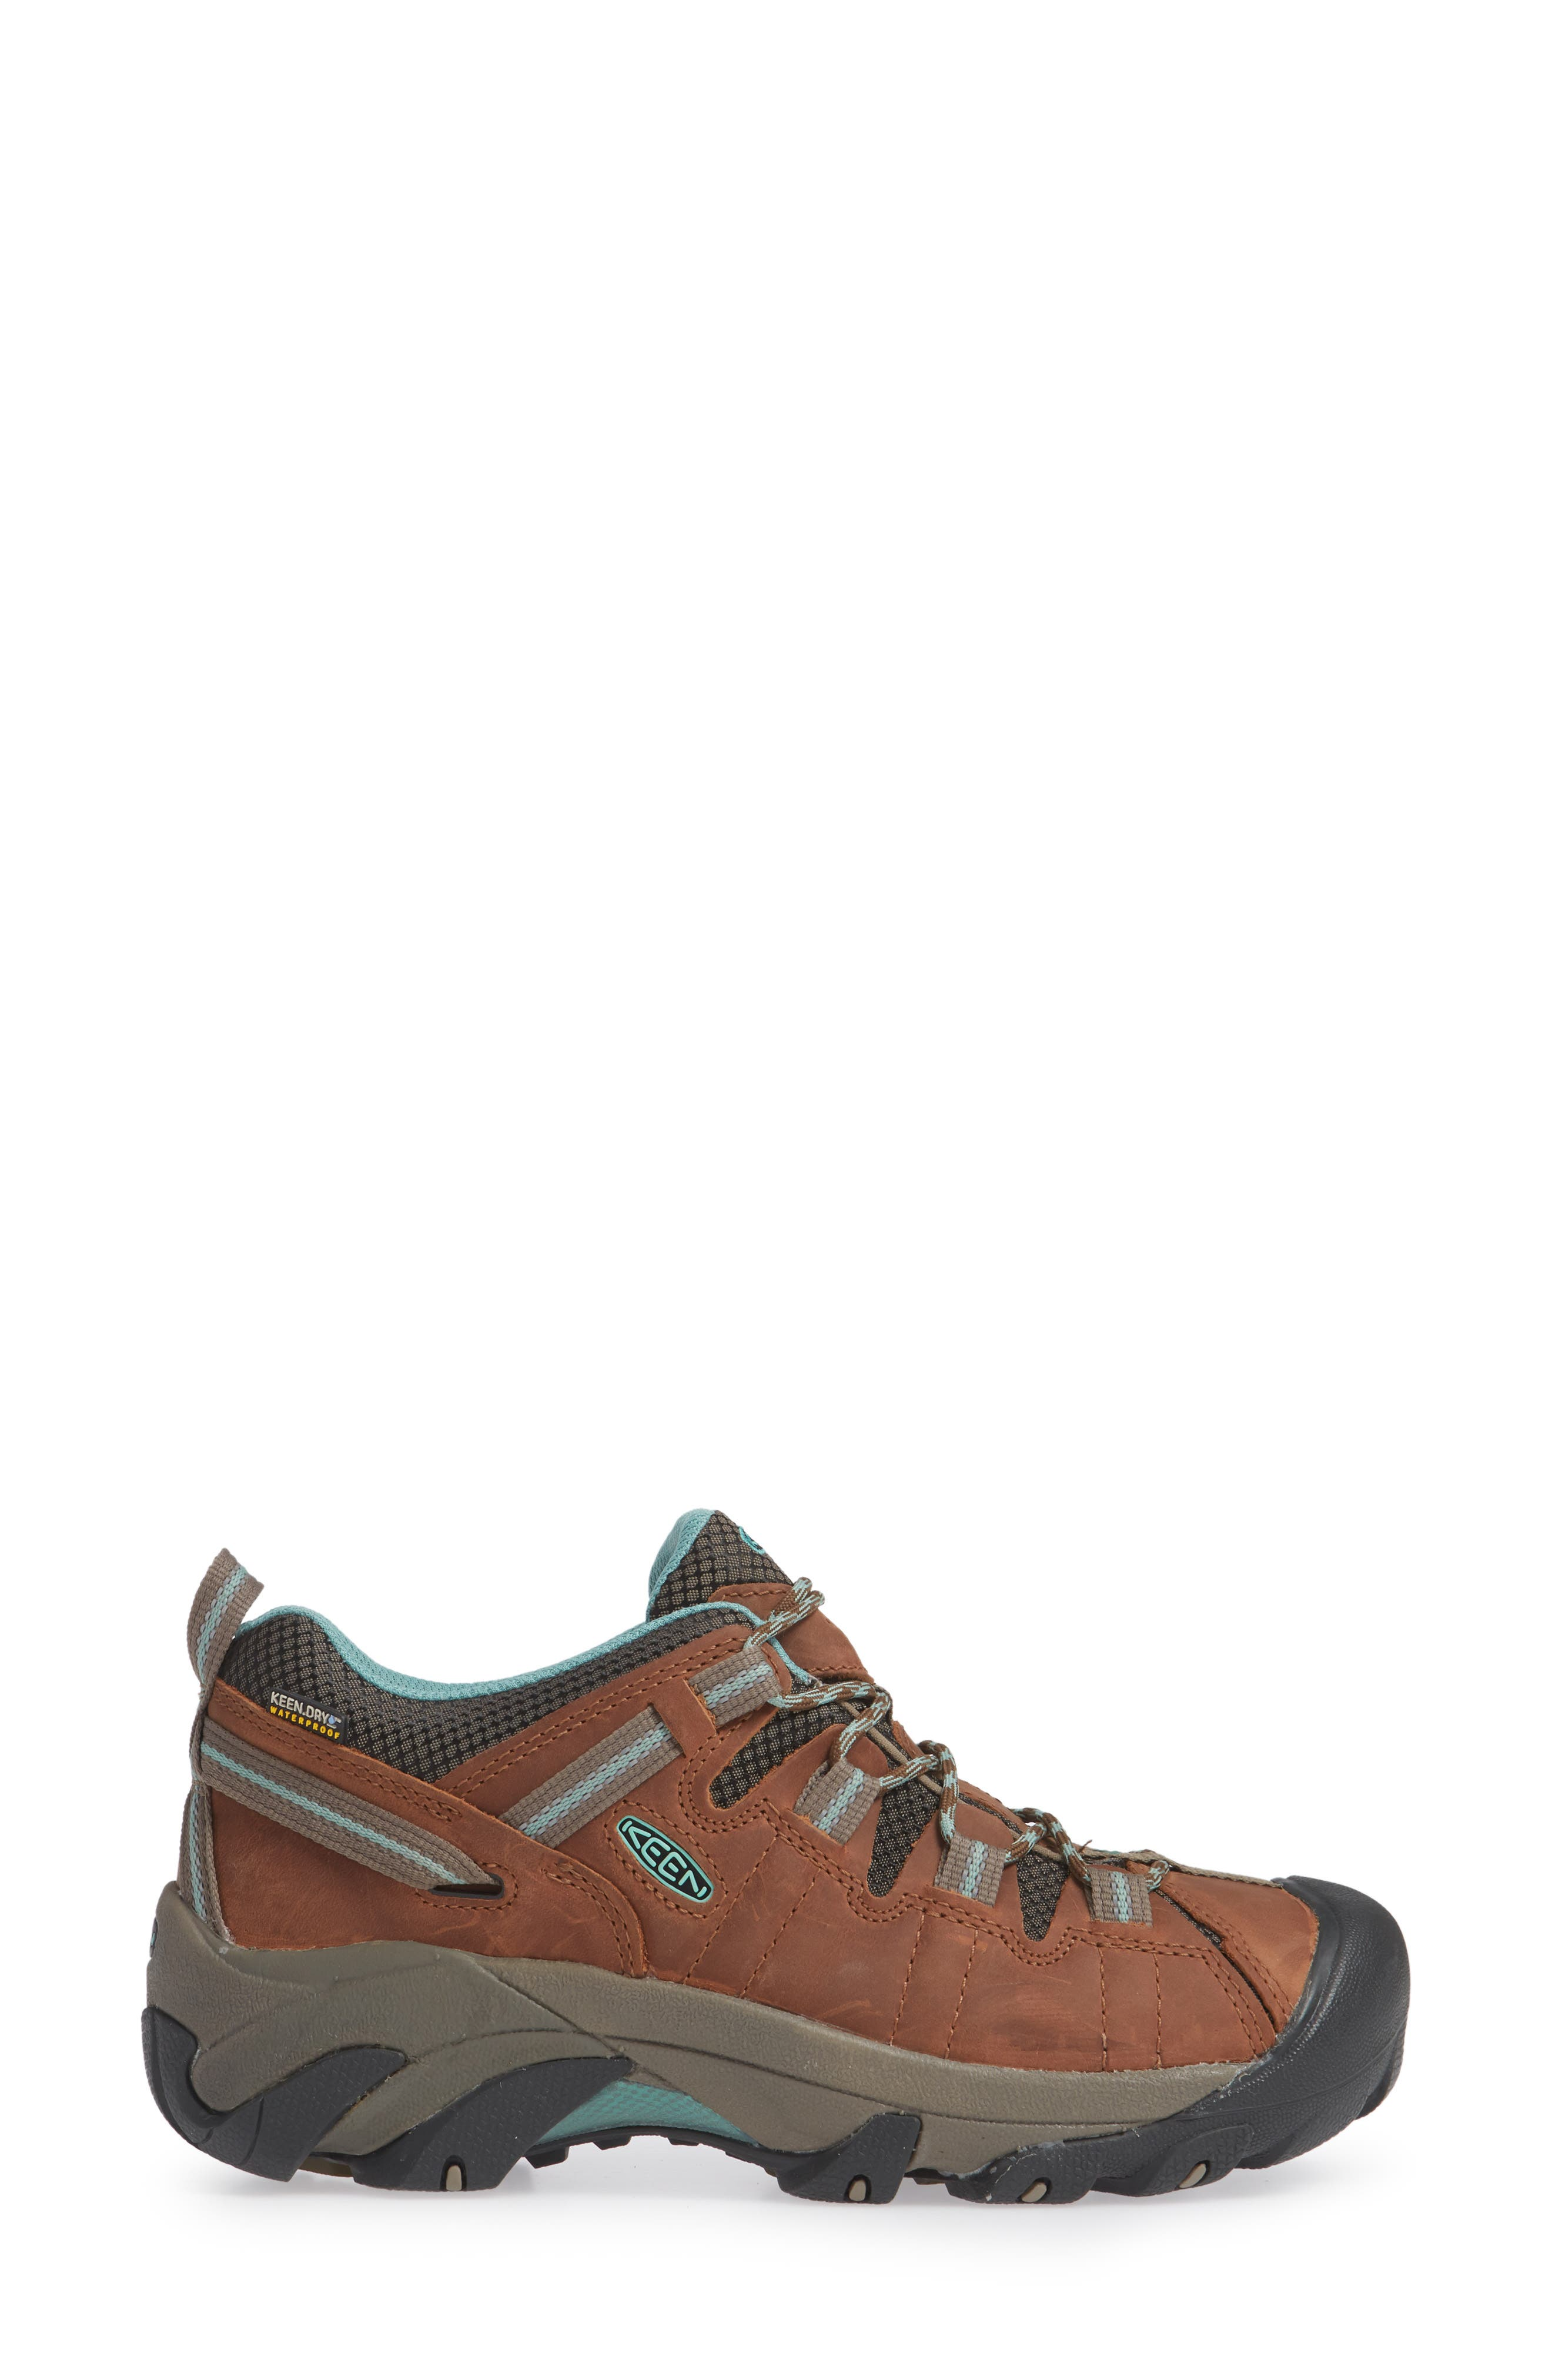 'Targhee II' Walking Shoe,                             Alternate thumbnail 3, color,                             DARK EARTH/ WASABI NUBUCK